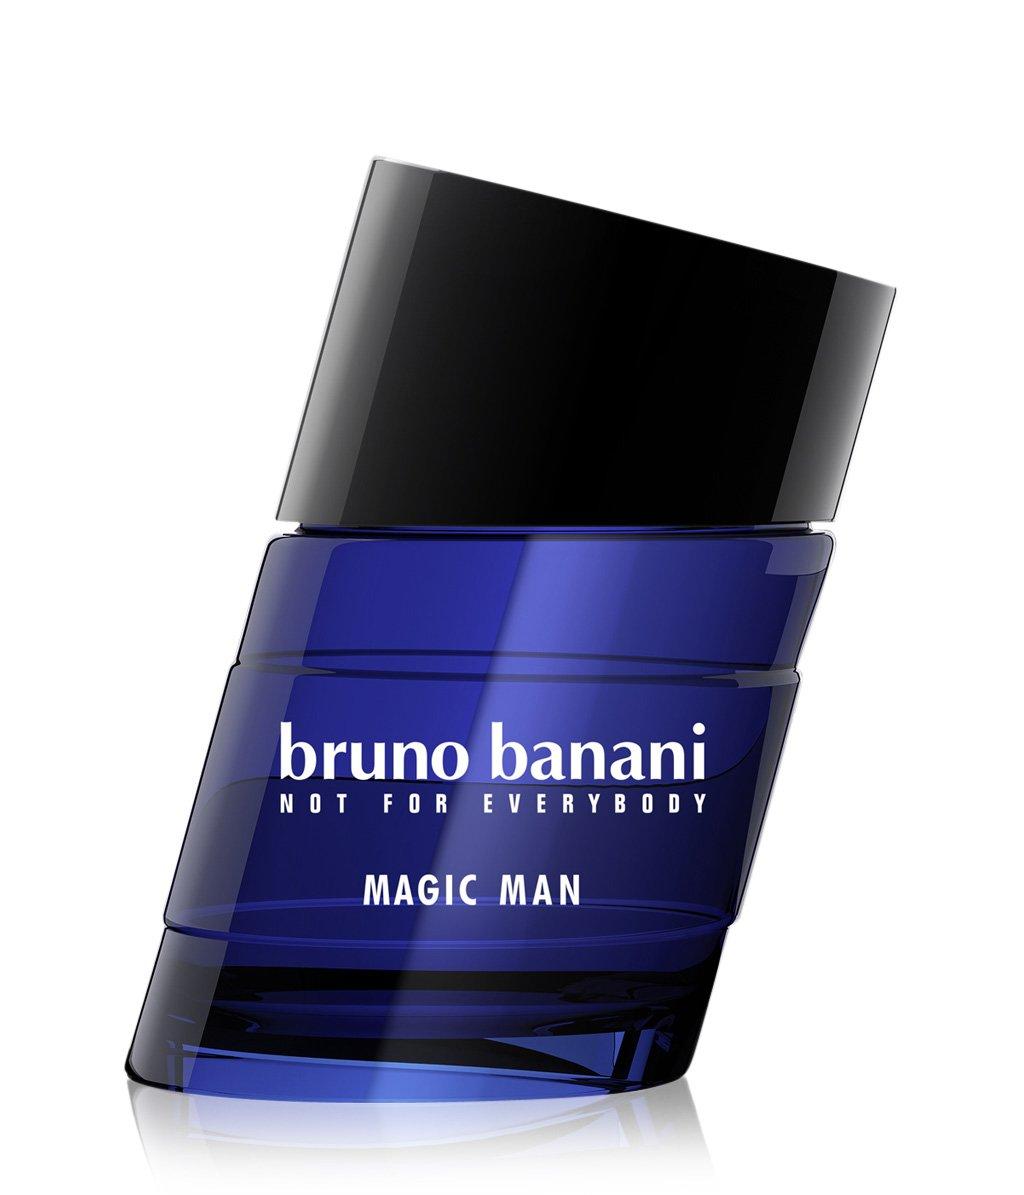 bruno banani magic man bestellen flaconi. Black Bedroom Furniture Sets. Home Design Ideas